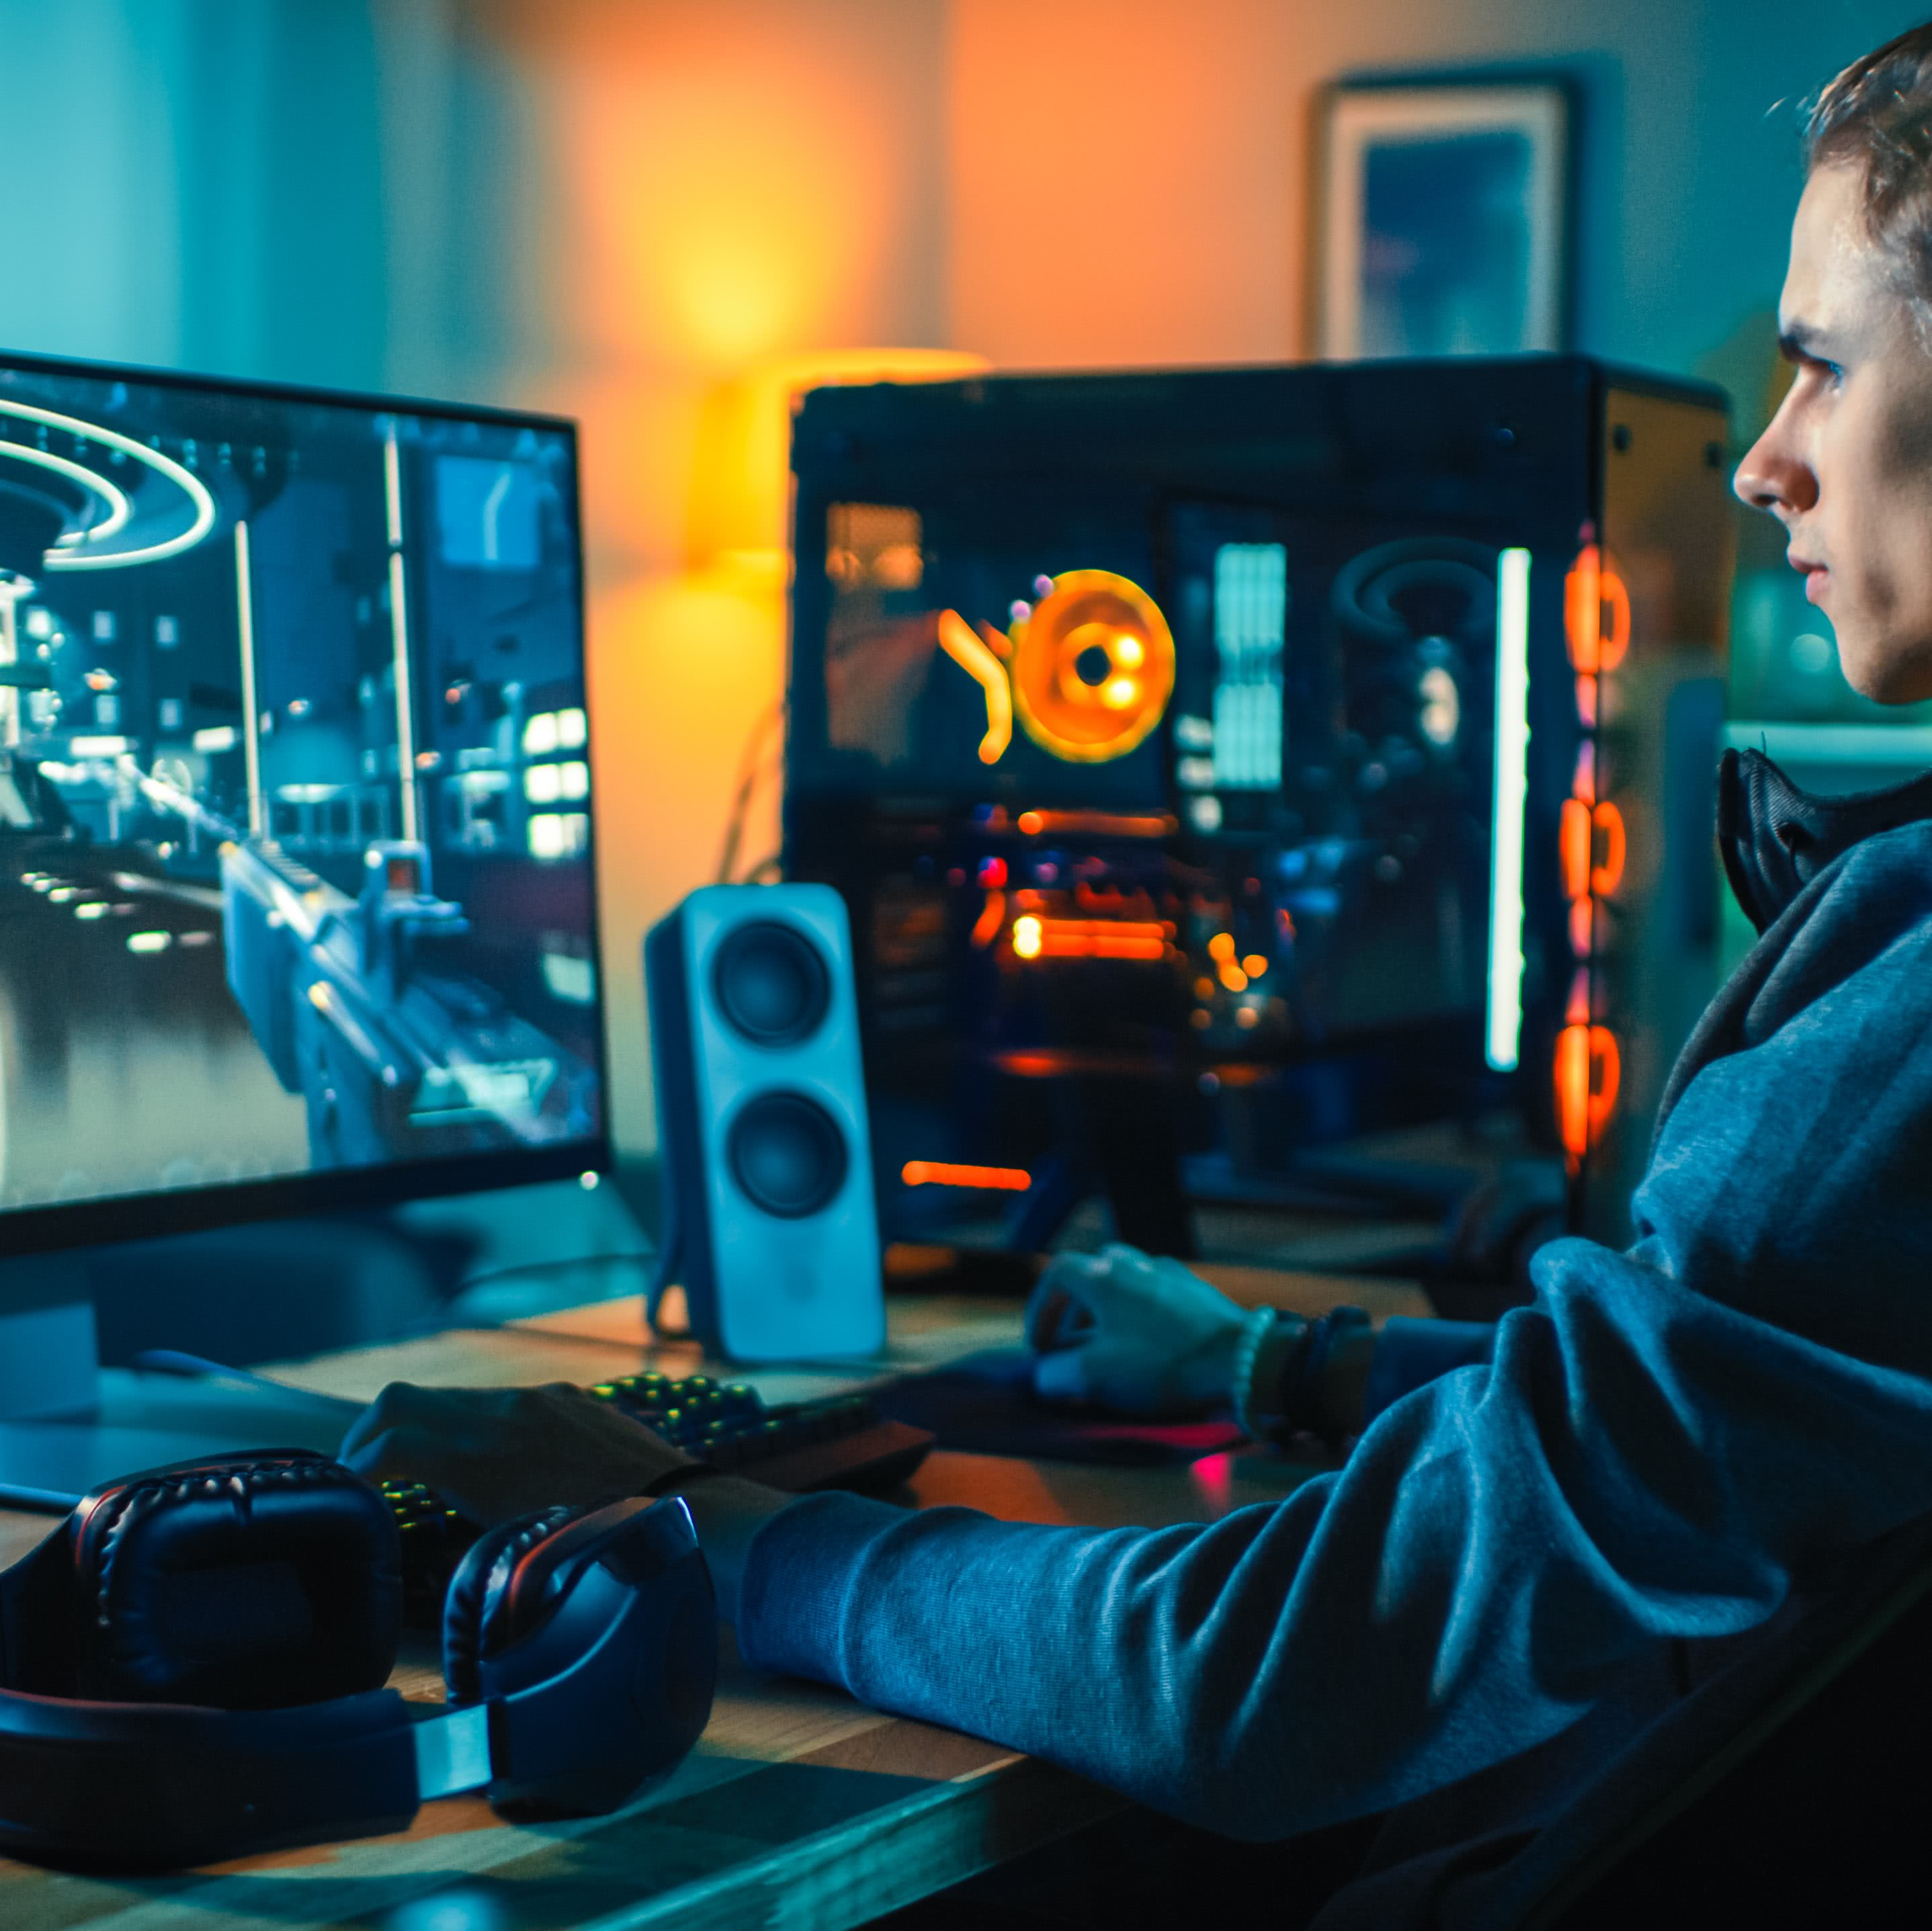 Life & Living - Gaming & Computers